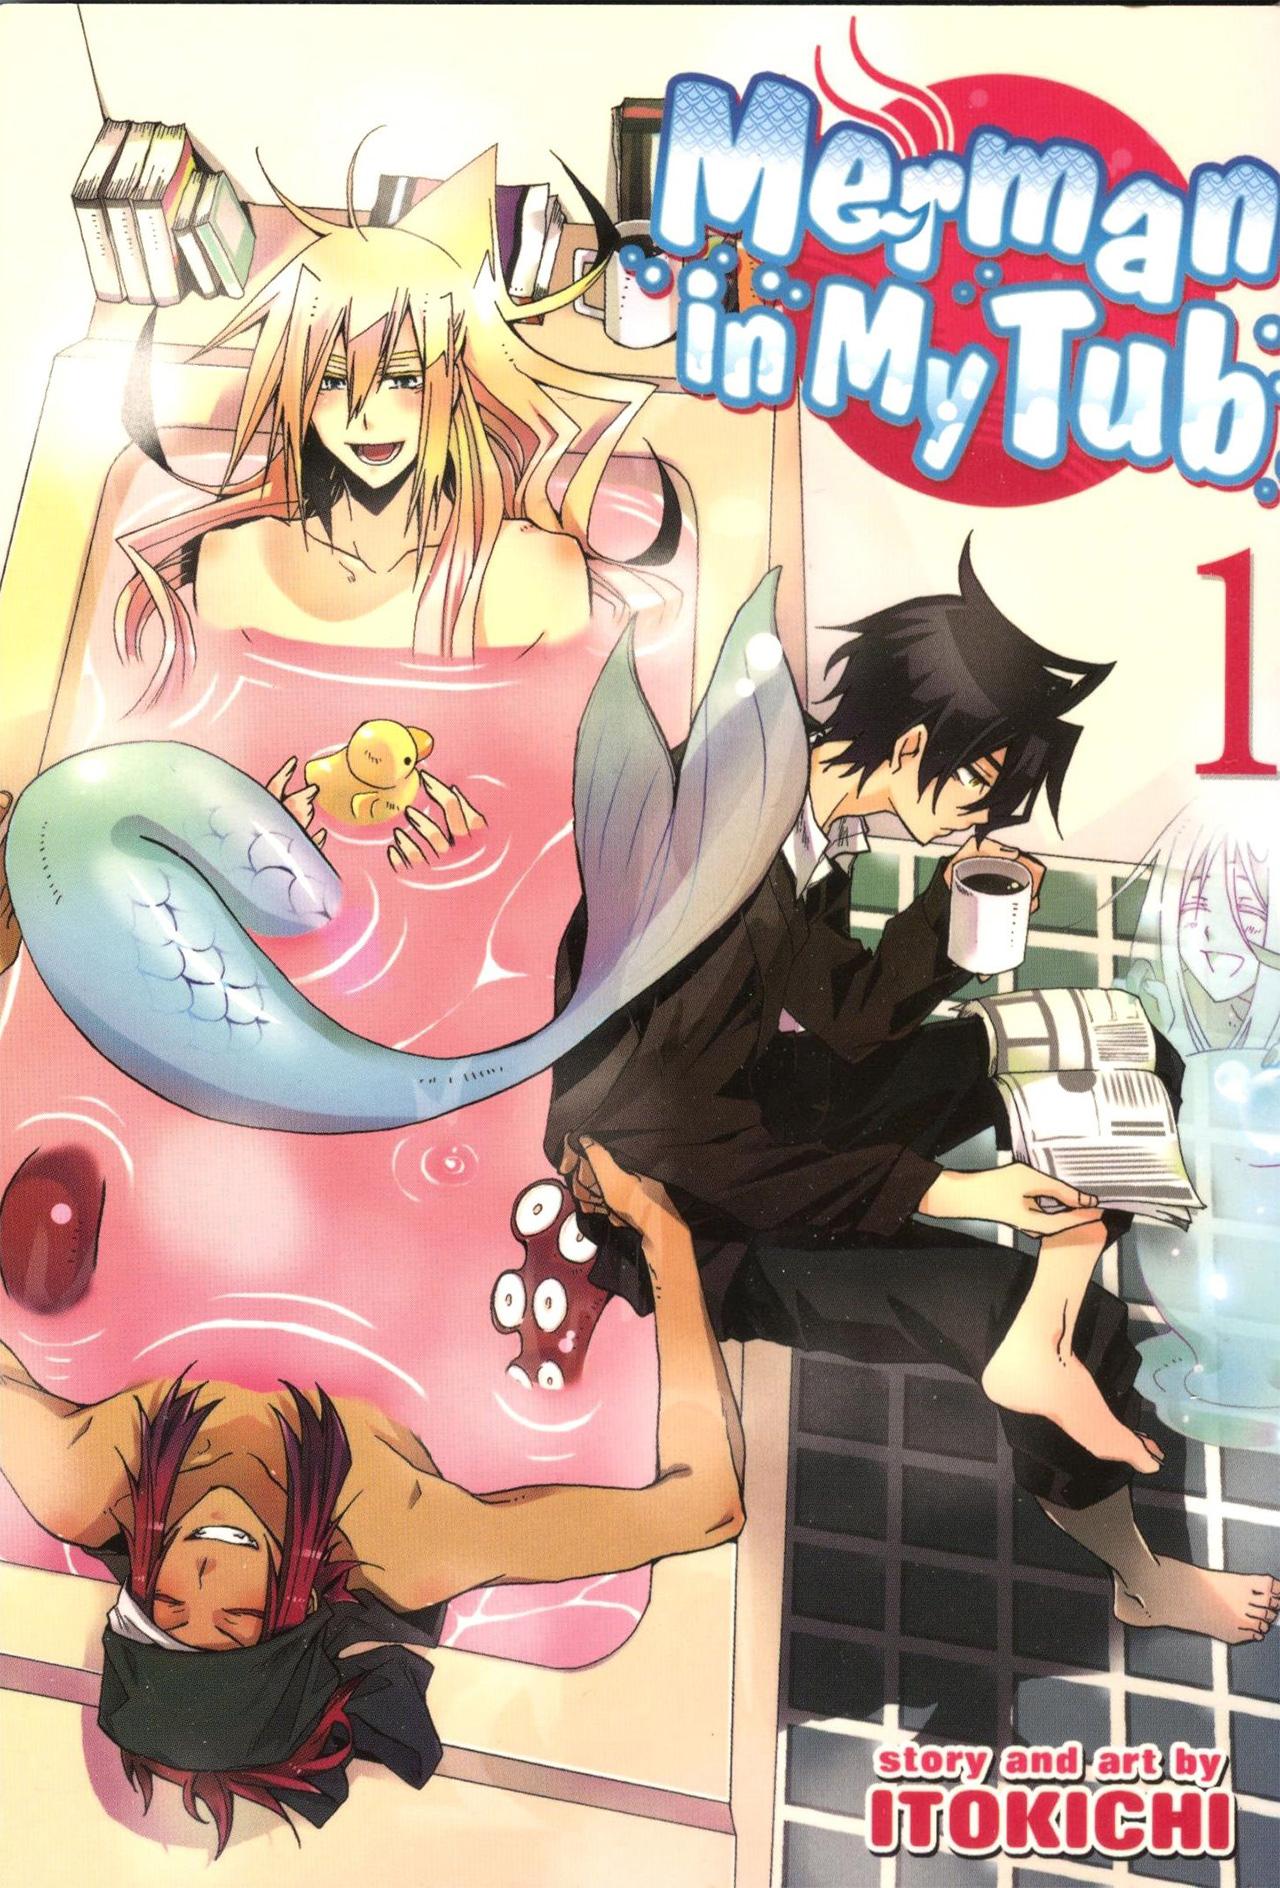 Capa do volume 1 de Orenchi no Furo Jijou (Merman in My Tub)